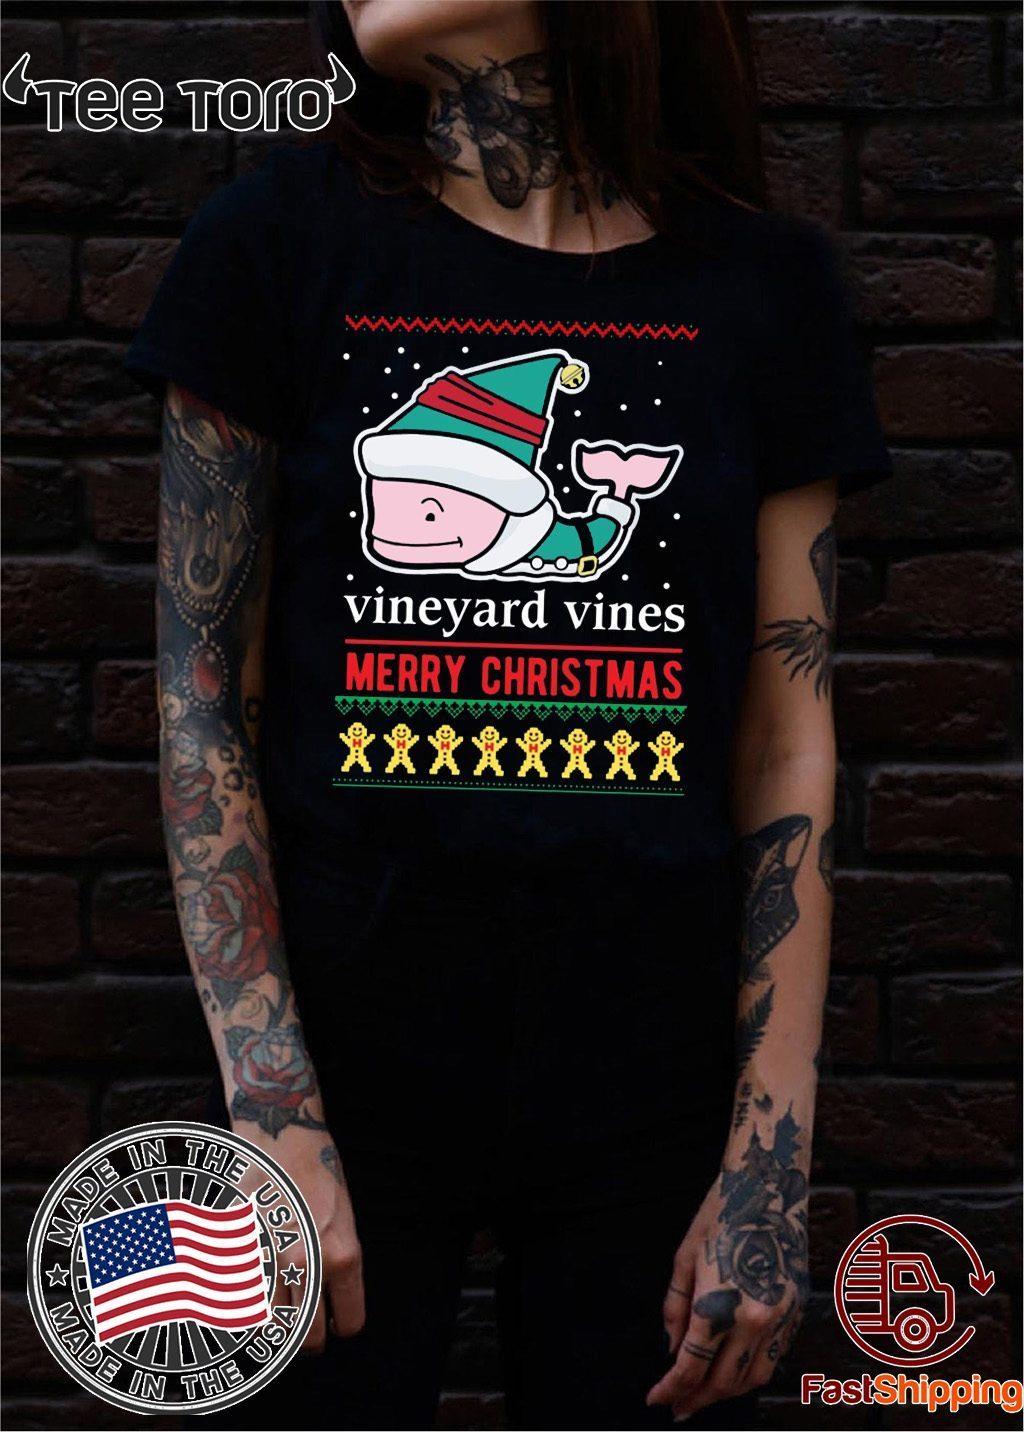 Vineyard Vines Christmas Shirt 2019.Vineyard Vines Merry Christmas For T Shirts Breakshirts Office